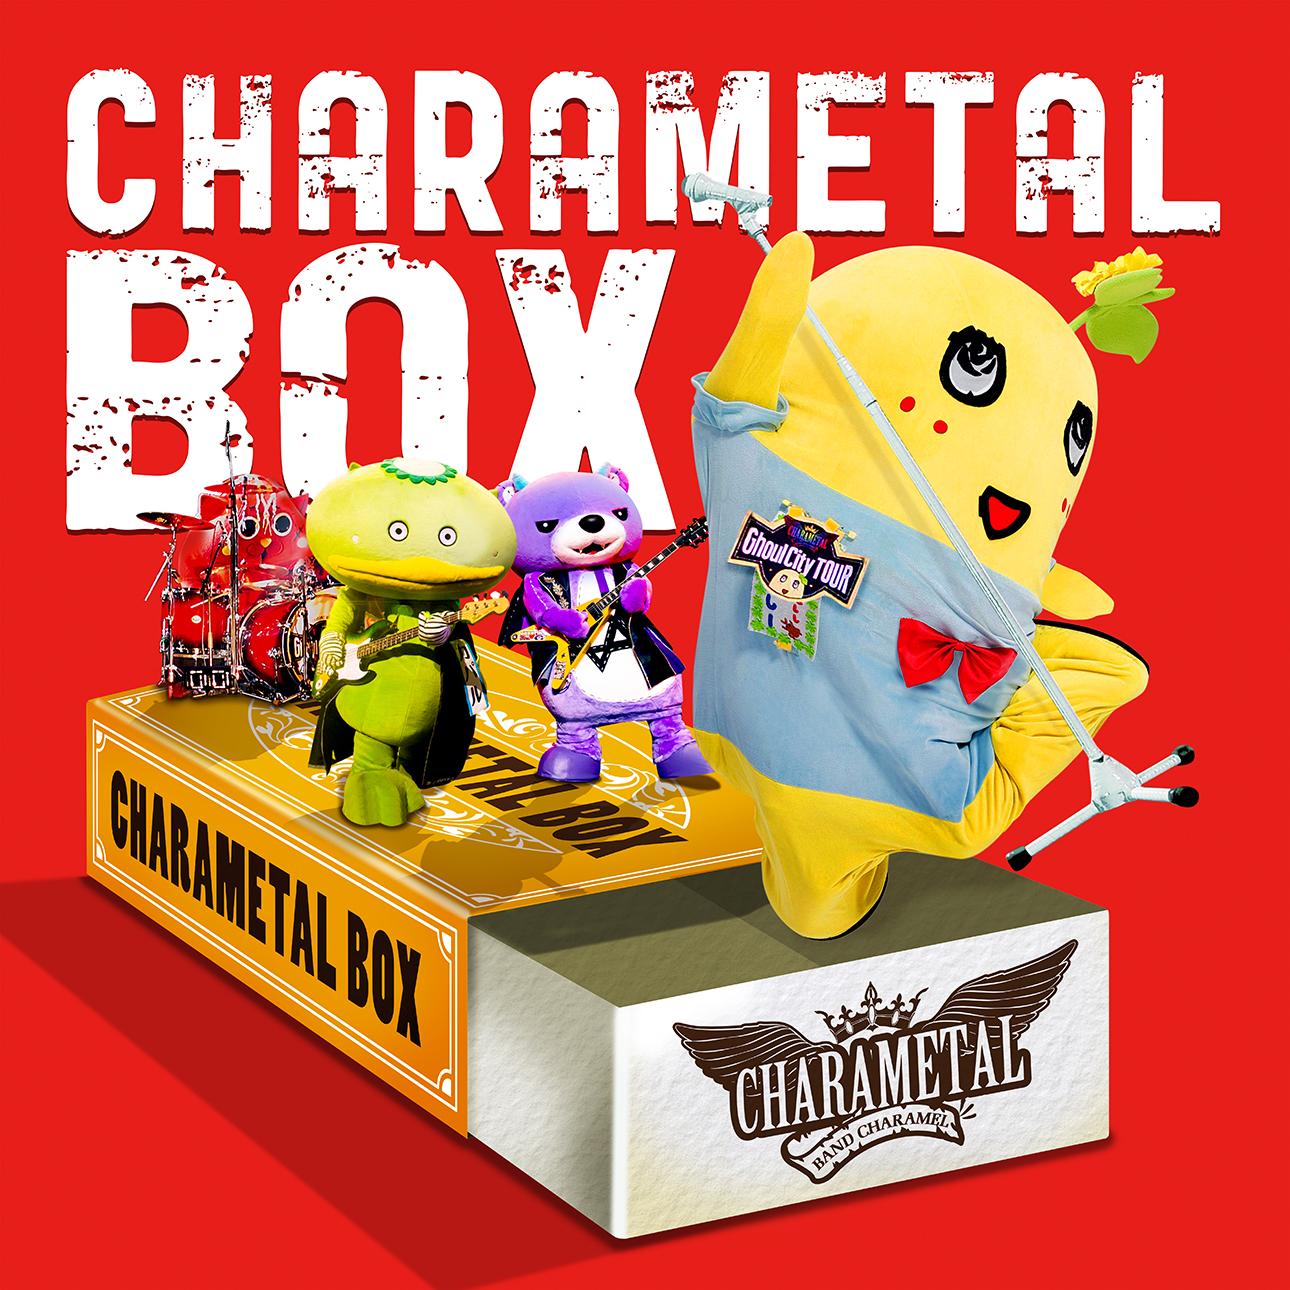 CHARAMETAL BOX